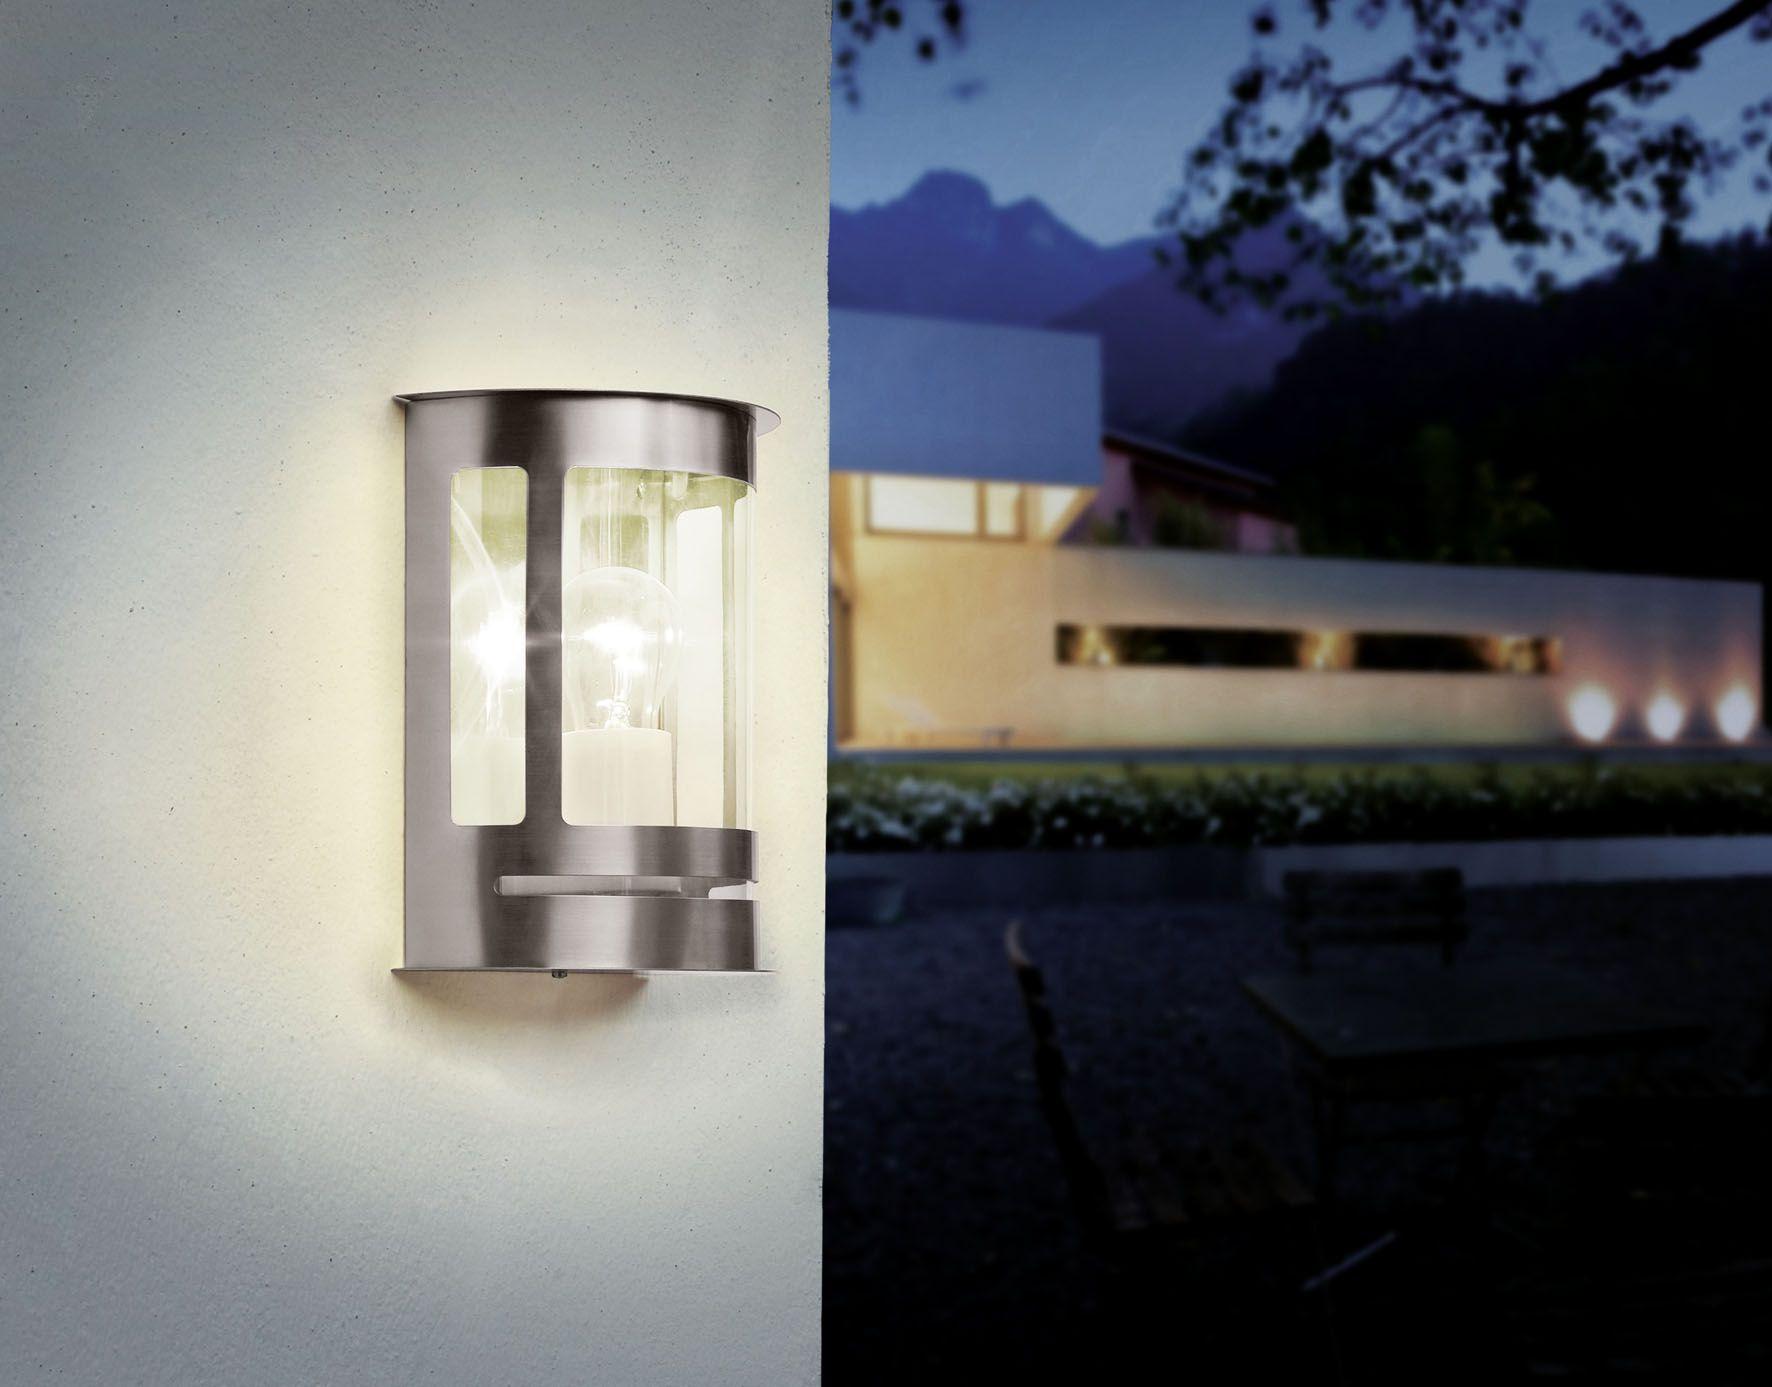 Plafoniera Eglo Led : Eglo outdoor lighting wall light daril stainless steel jd